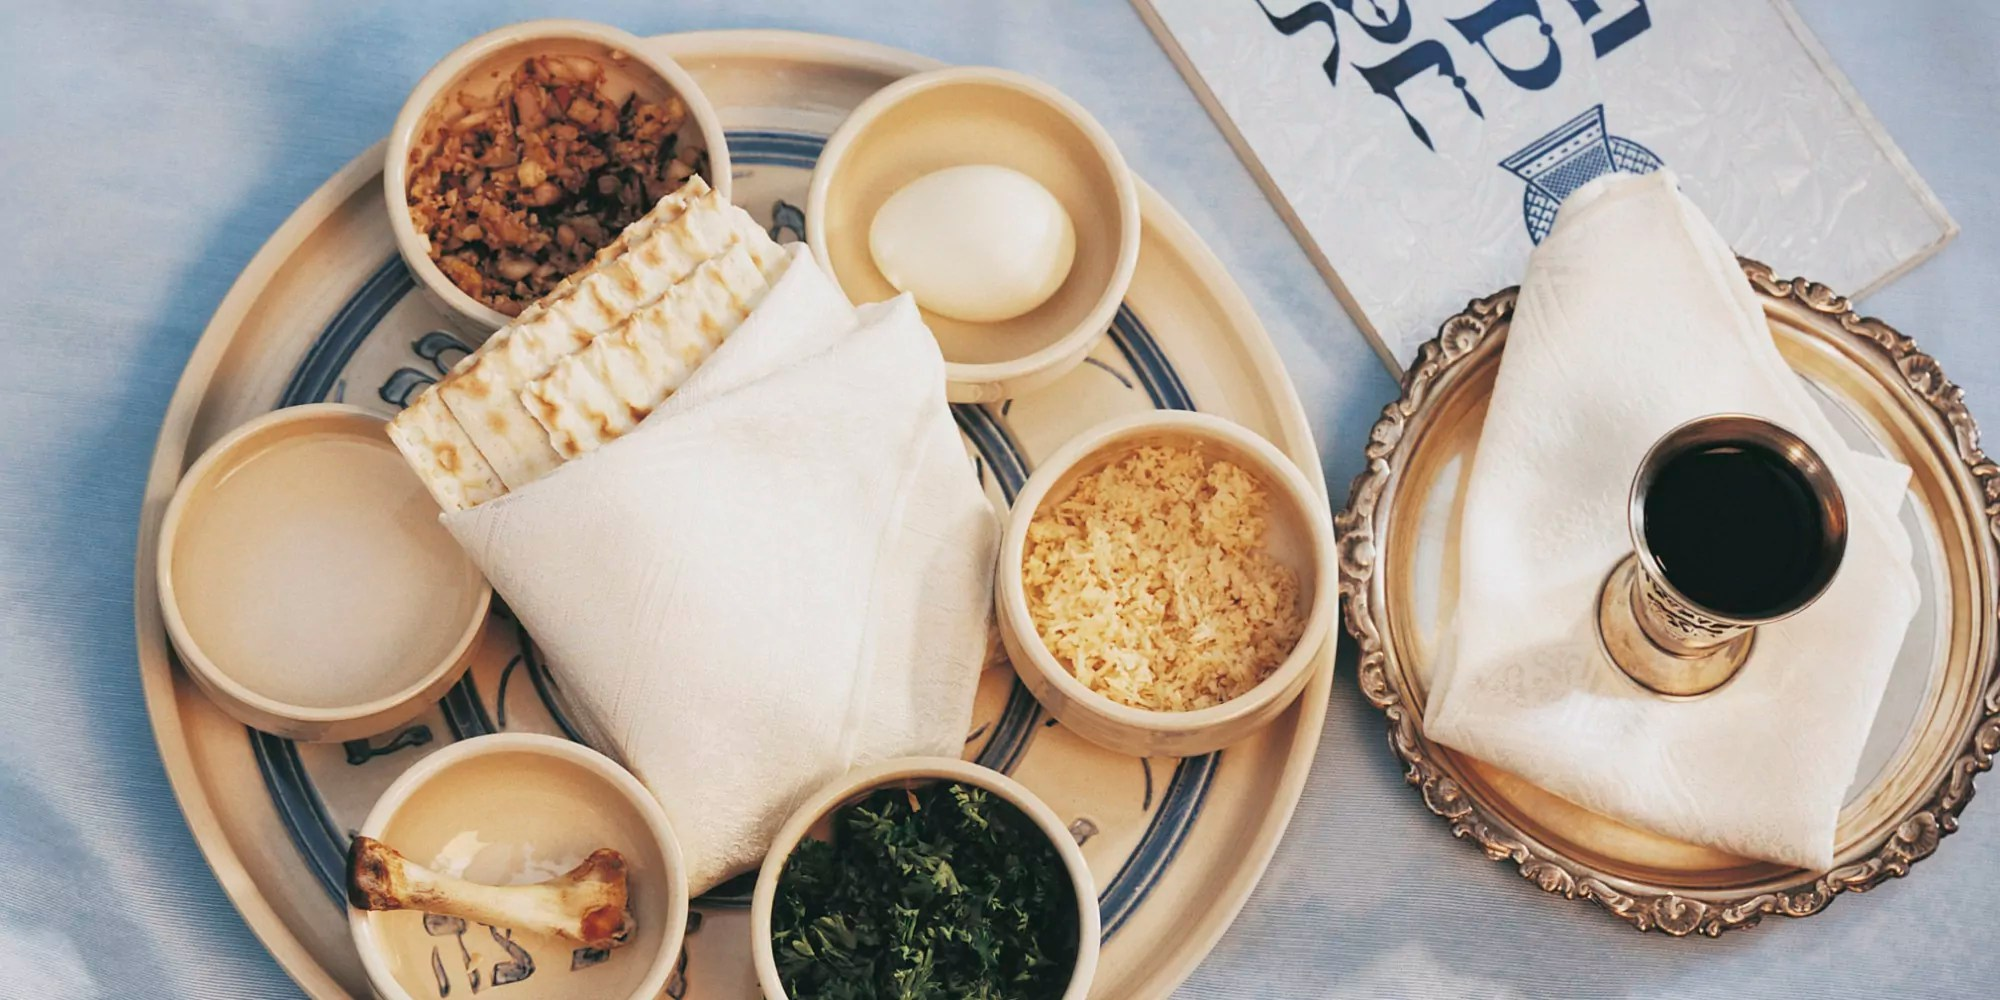 comida tradicional de Pésaj